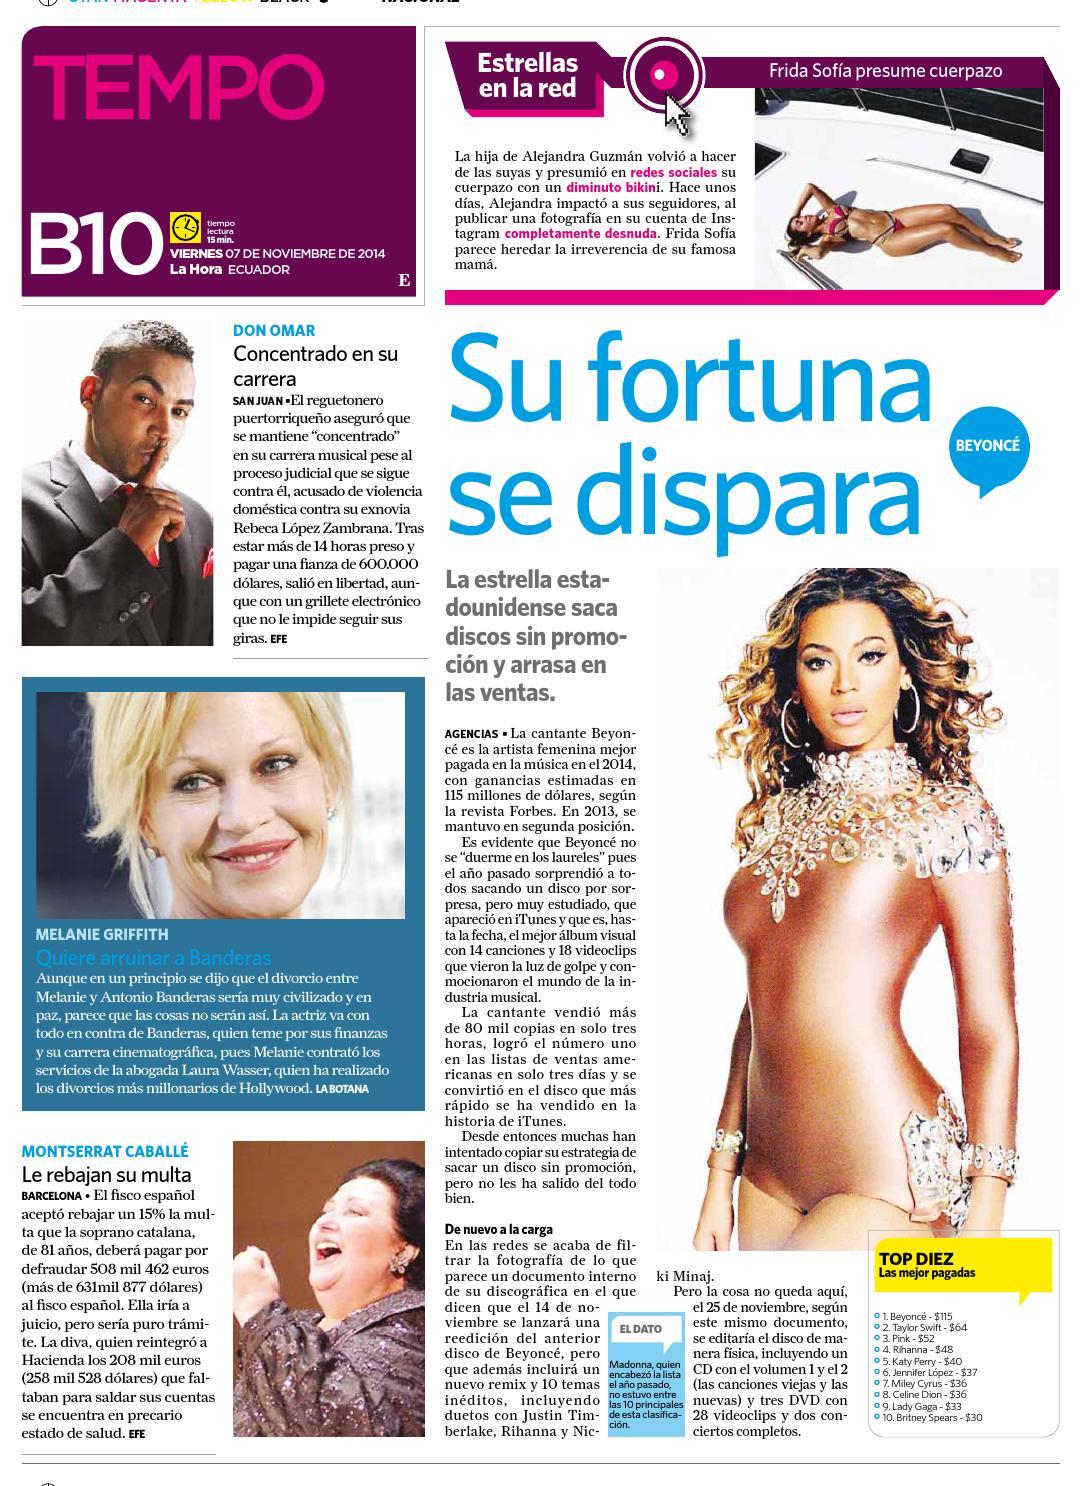 Cotopaxi 7 noviembre 2014 by Diario La Hora Ecuador - issuu bcef374c3d8e